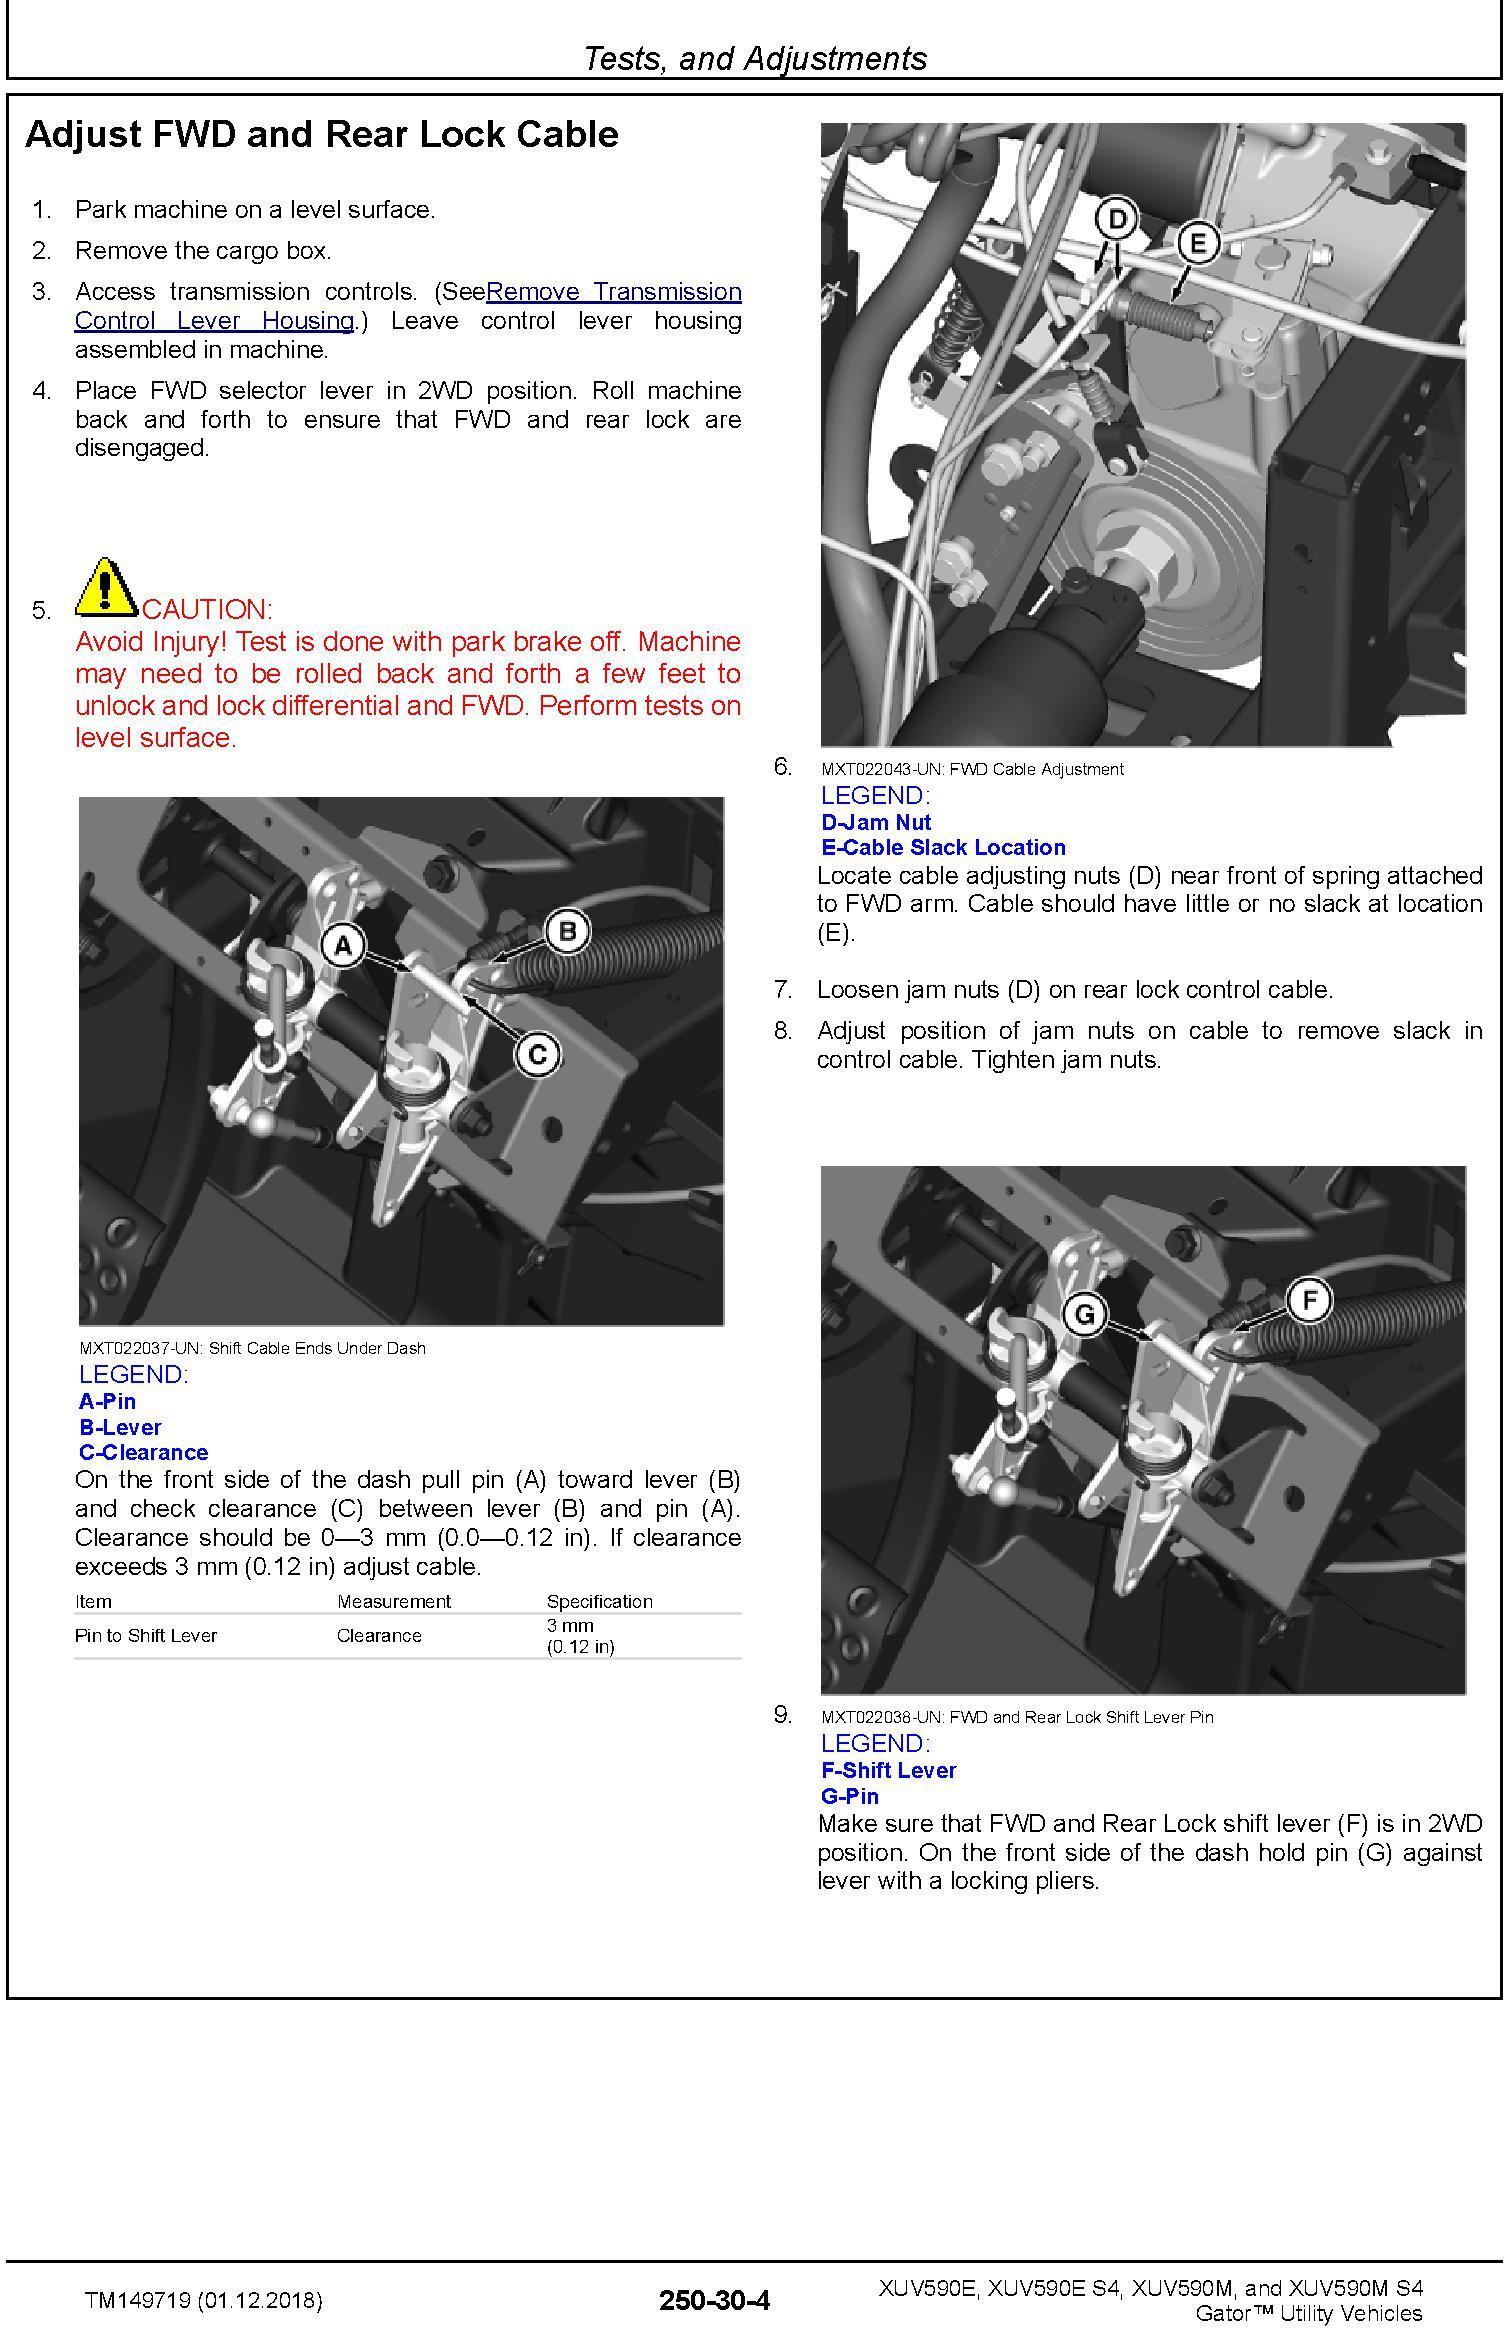 John Deere XUV590E(S4), XUV590E(S4) Gator Utility Vehicles (SN. 010001-) Technical Manual (TM149719) - 3